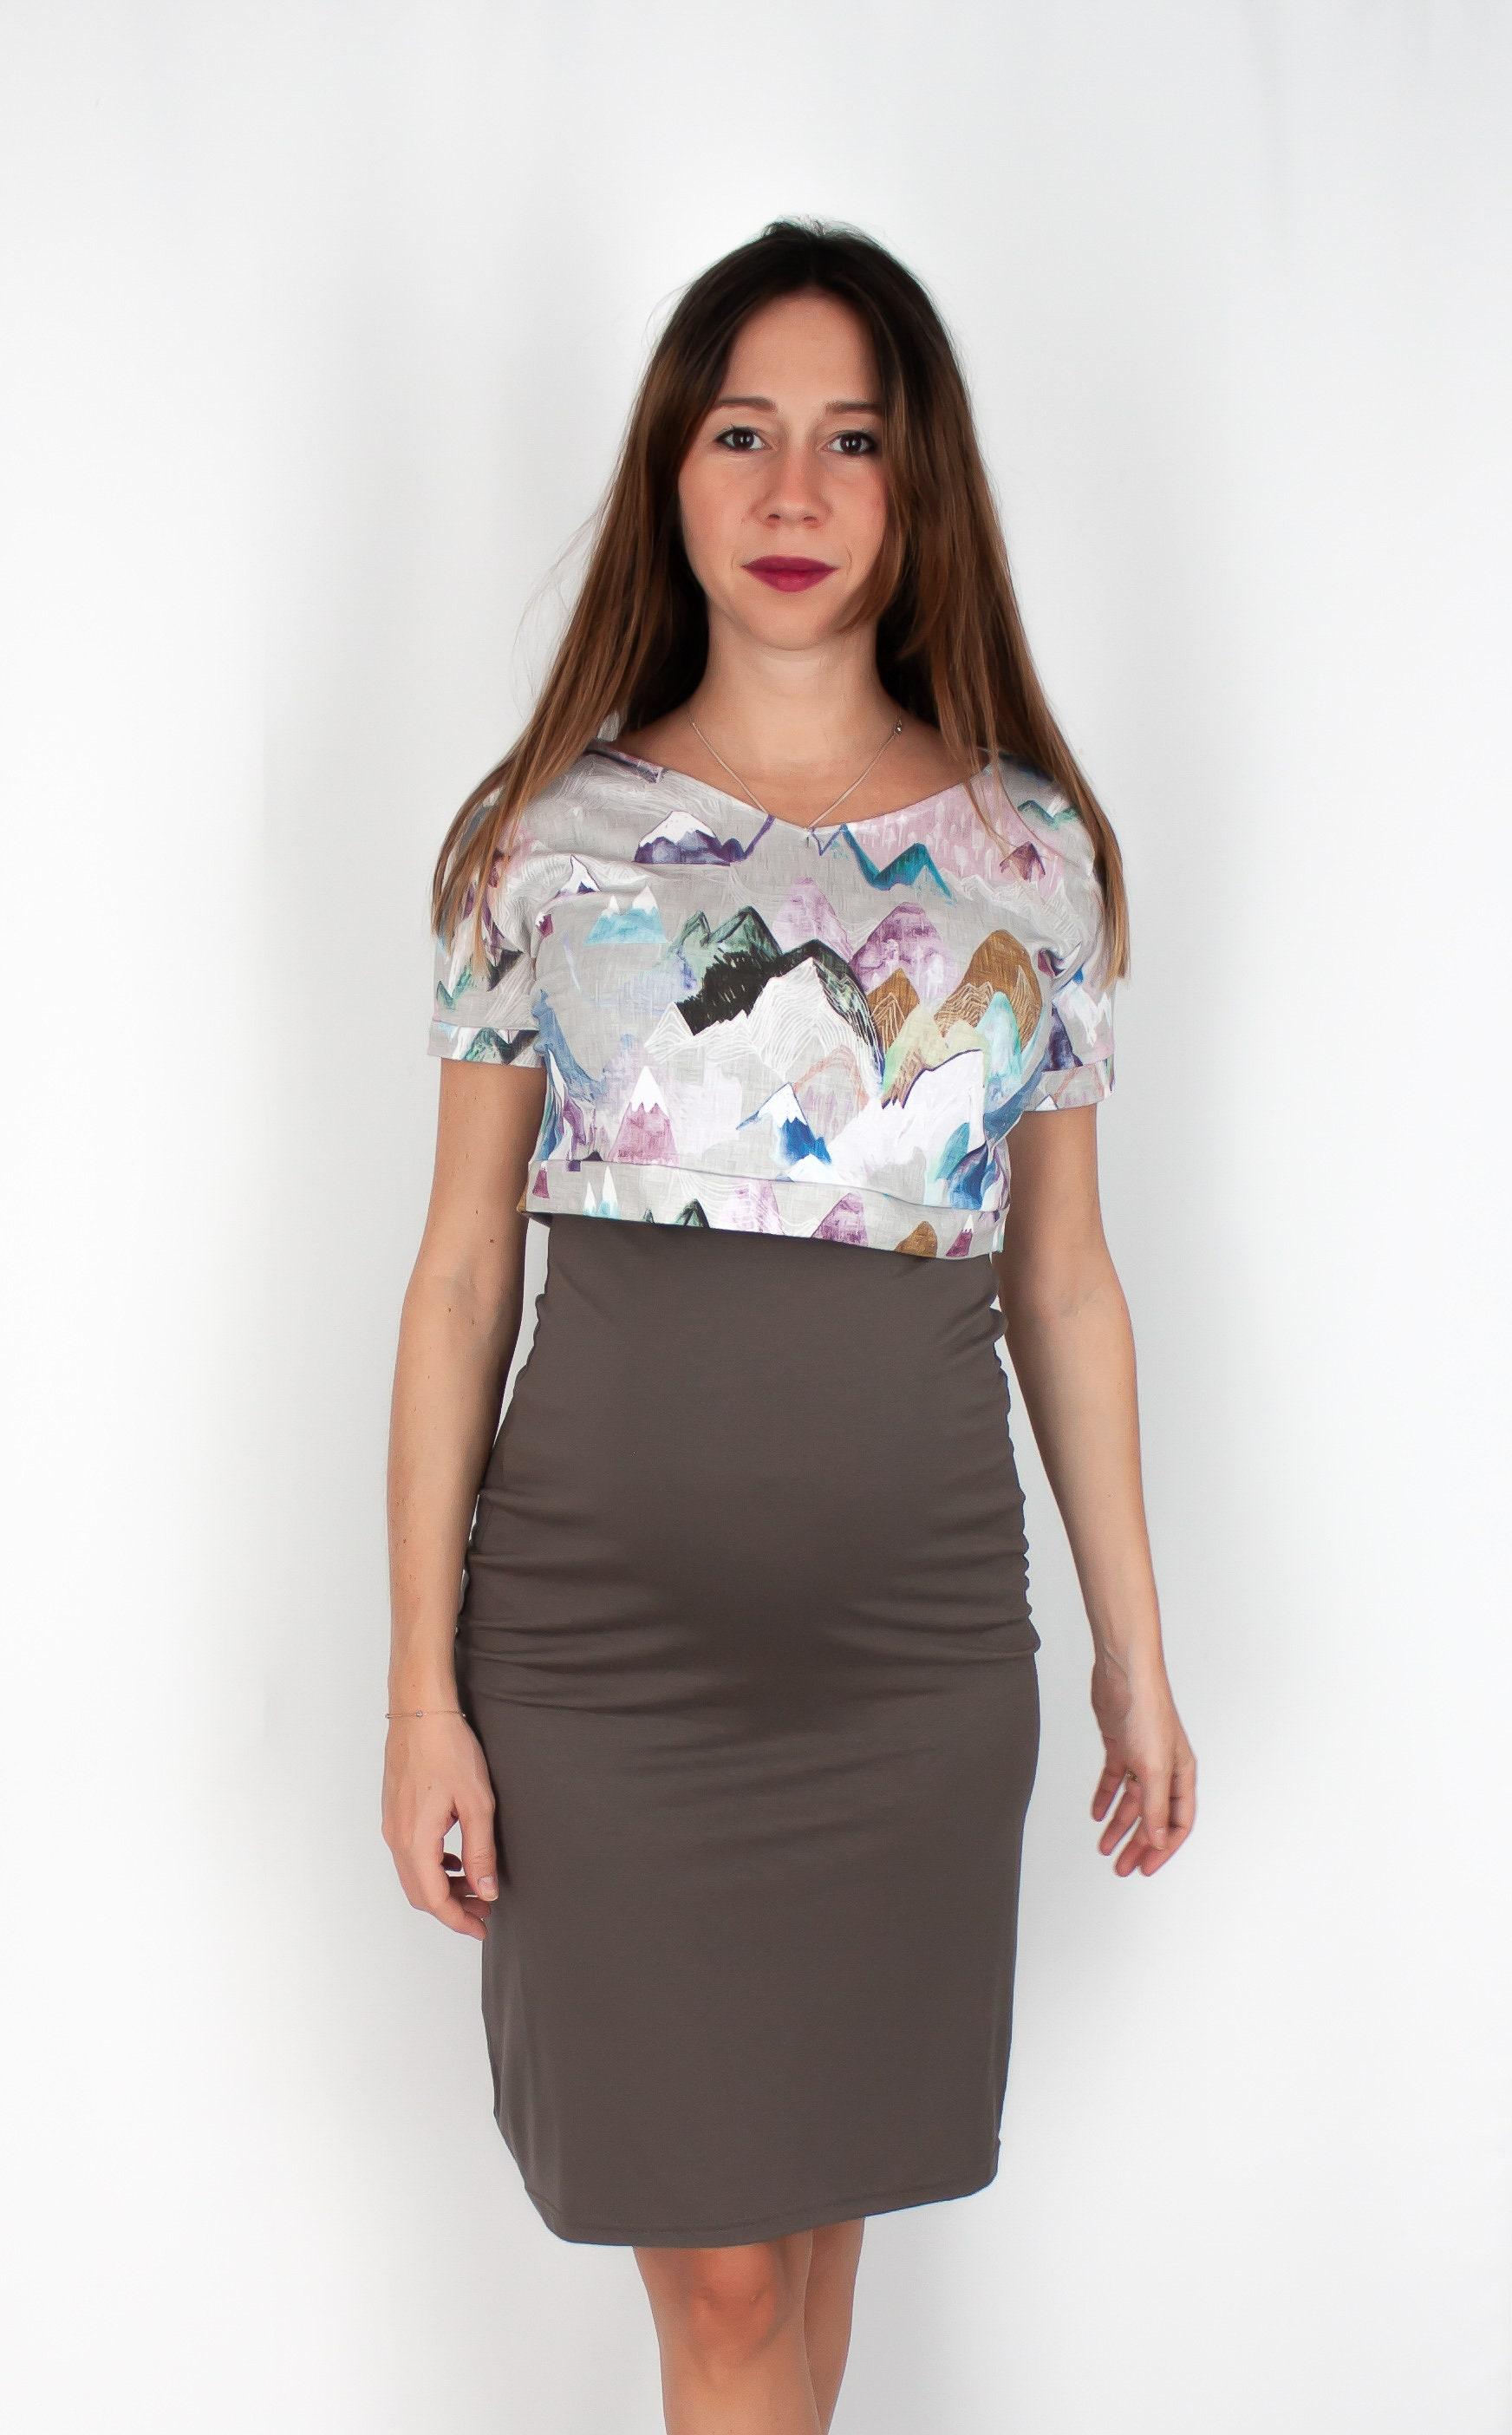 e40d4a3f18043 Boho Maternity dress & Nursing clothes for breastfeeding. | Etsy